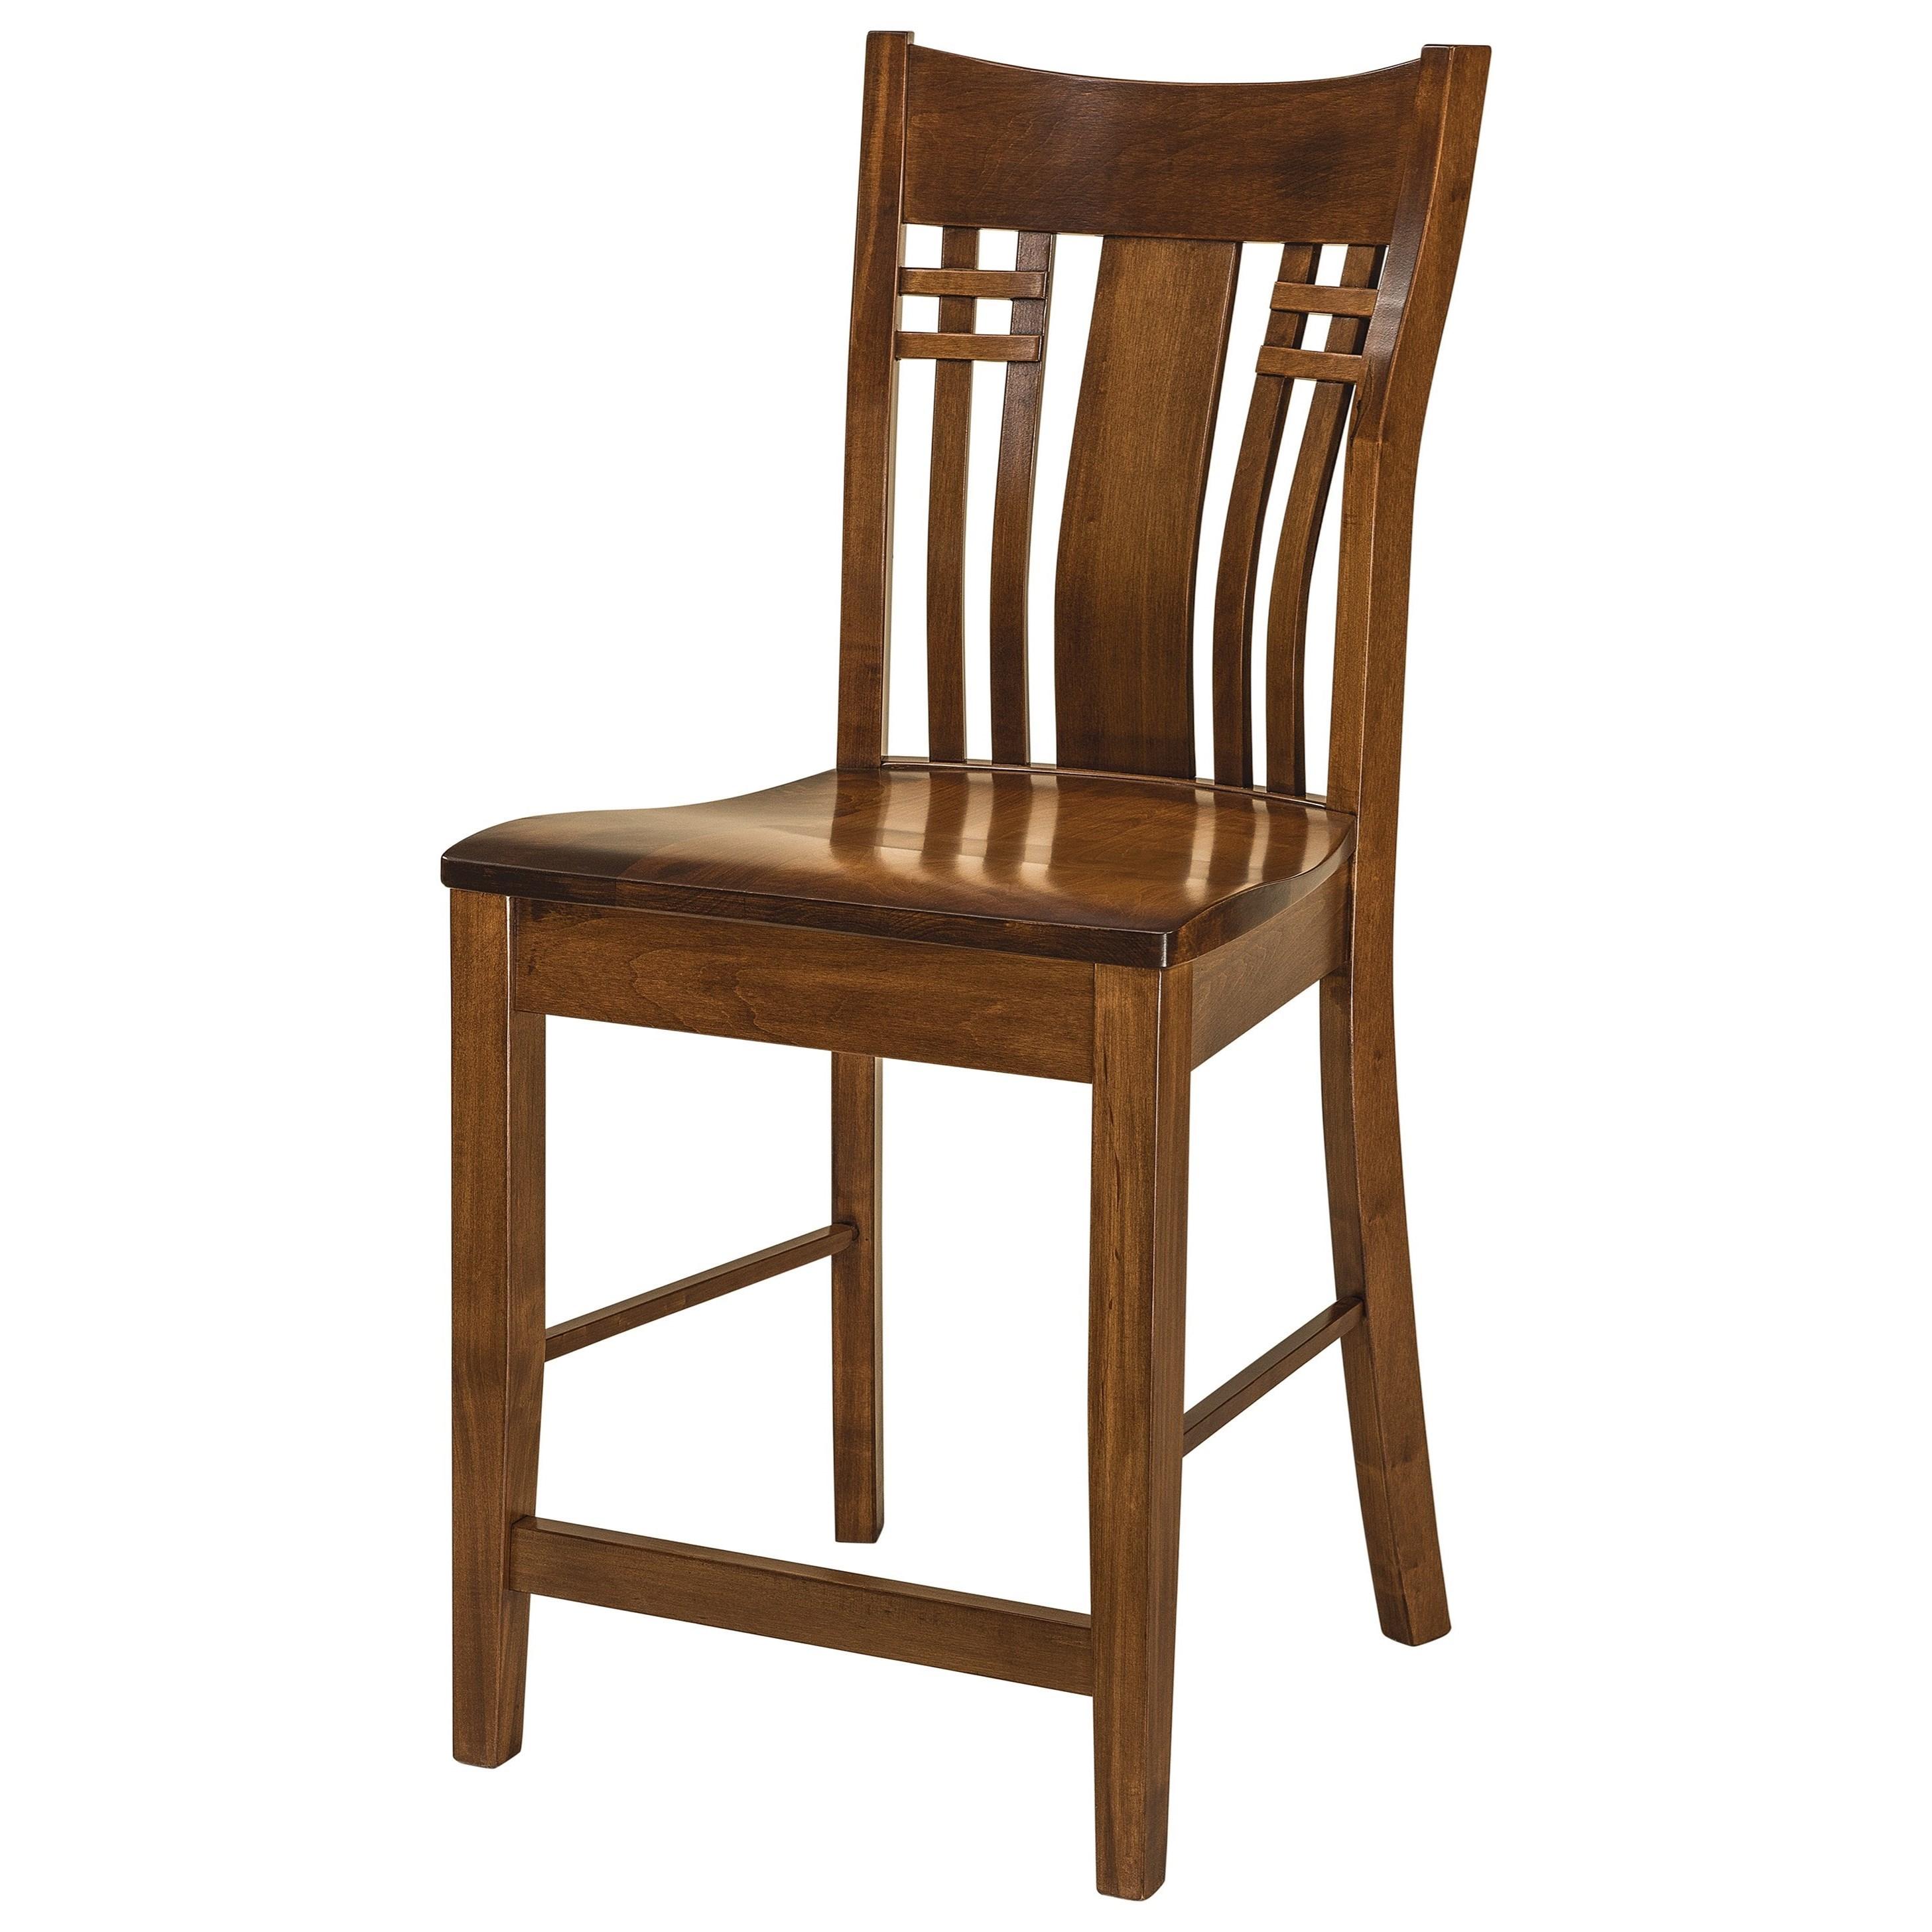 Stationary Bar Stool - Fabric Seat